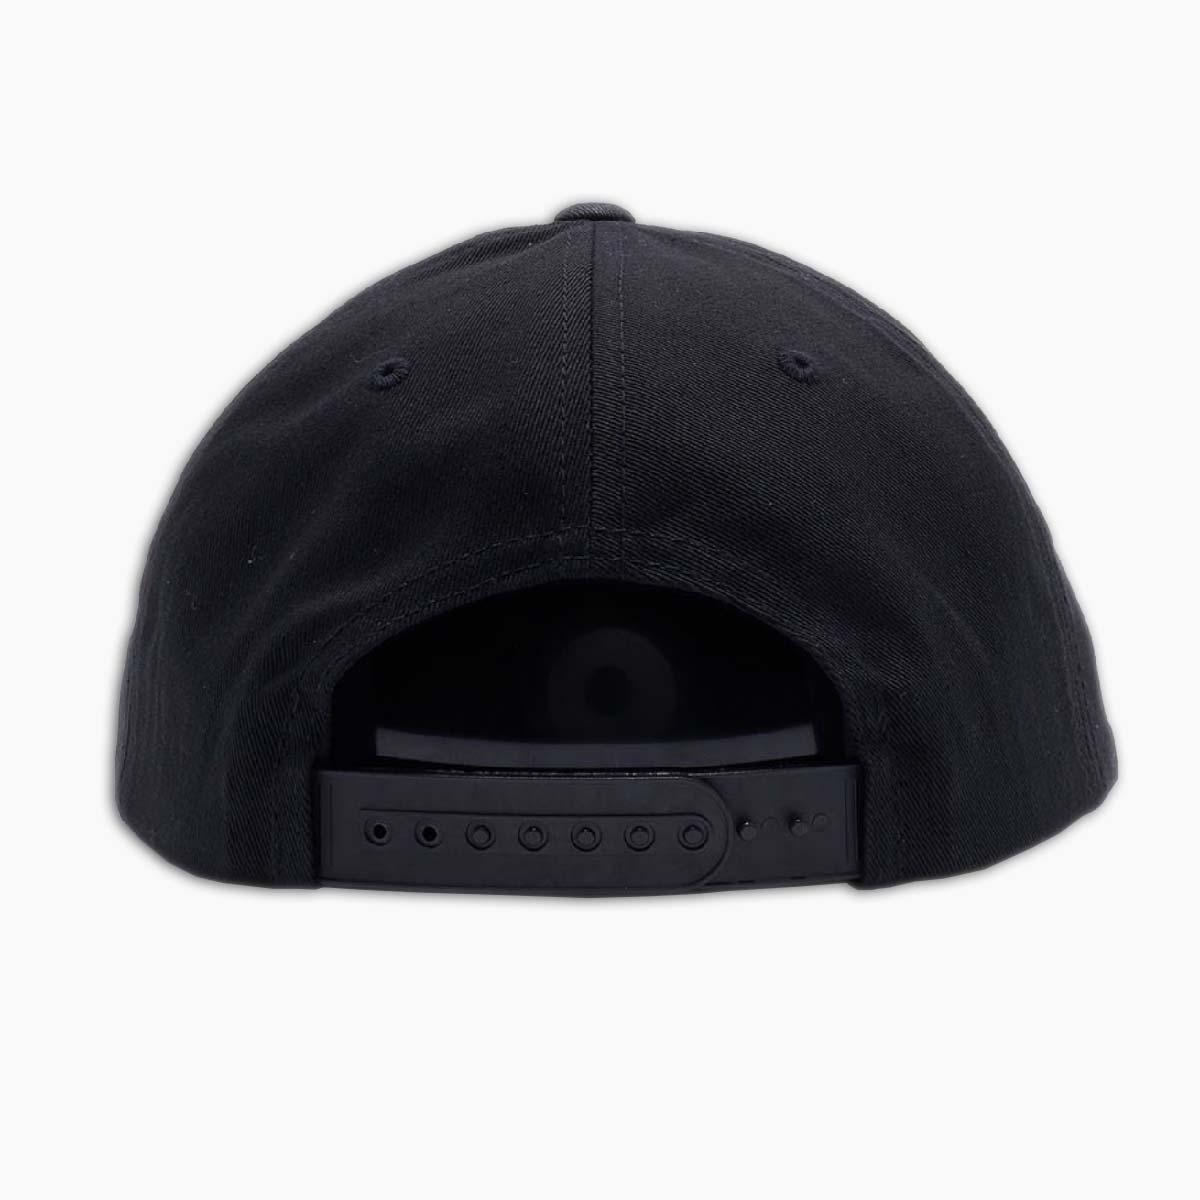 0395ae17372 los angeles LA LOGO classic snapback hat by loma+pier hat store